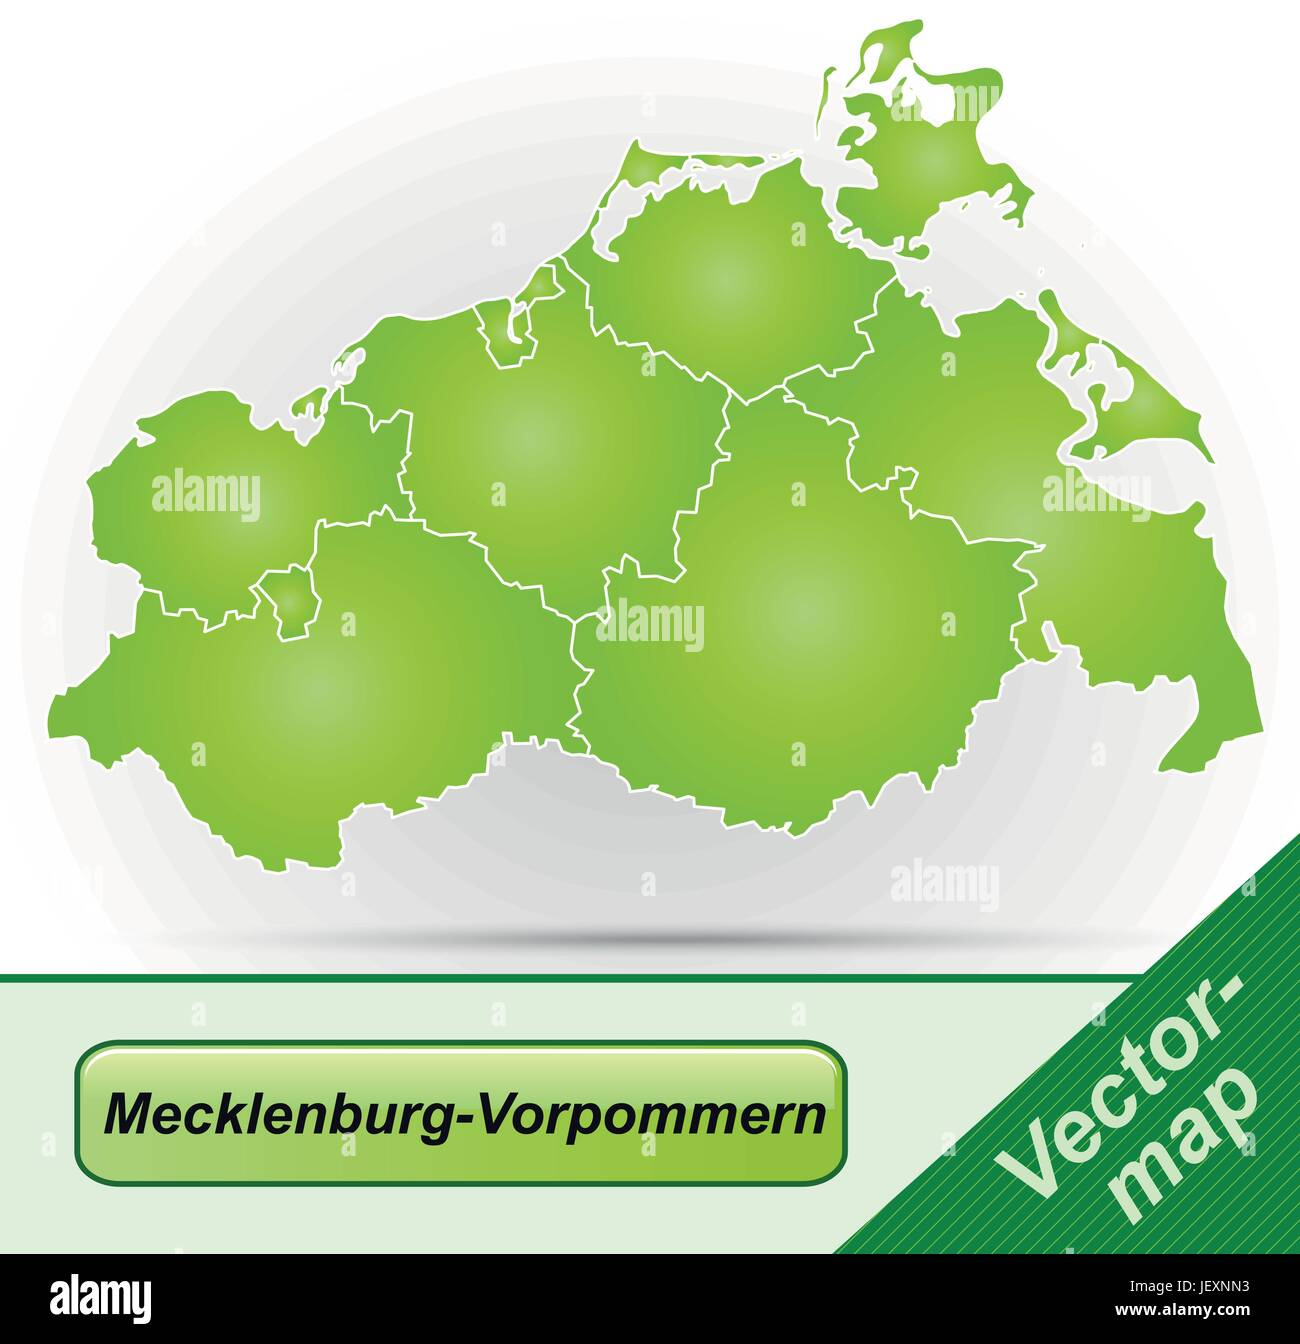 model, design, project, concept, plan, draft, green, illustration, border, - Stock Vector